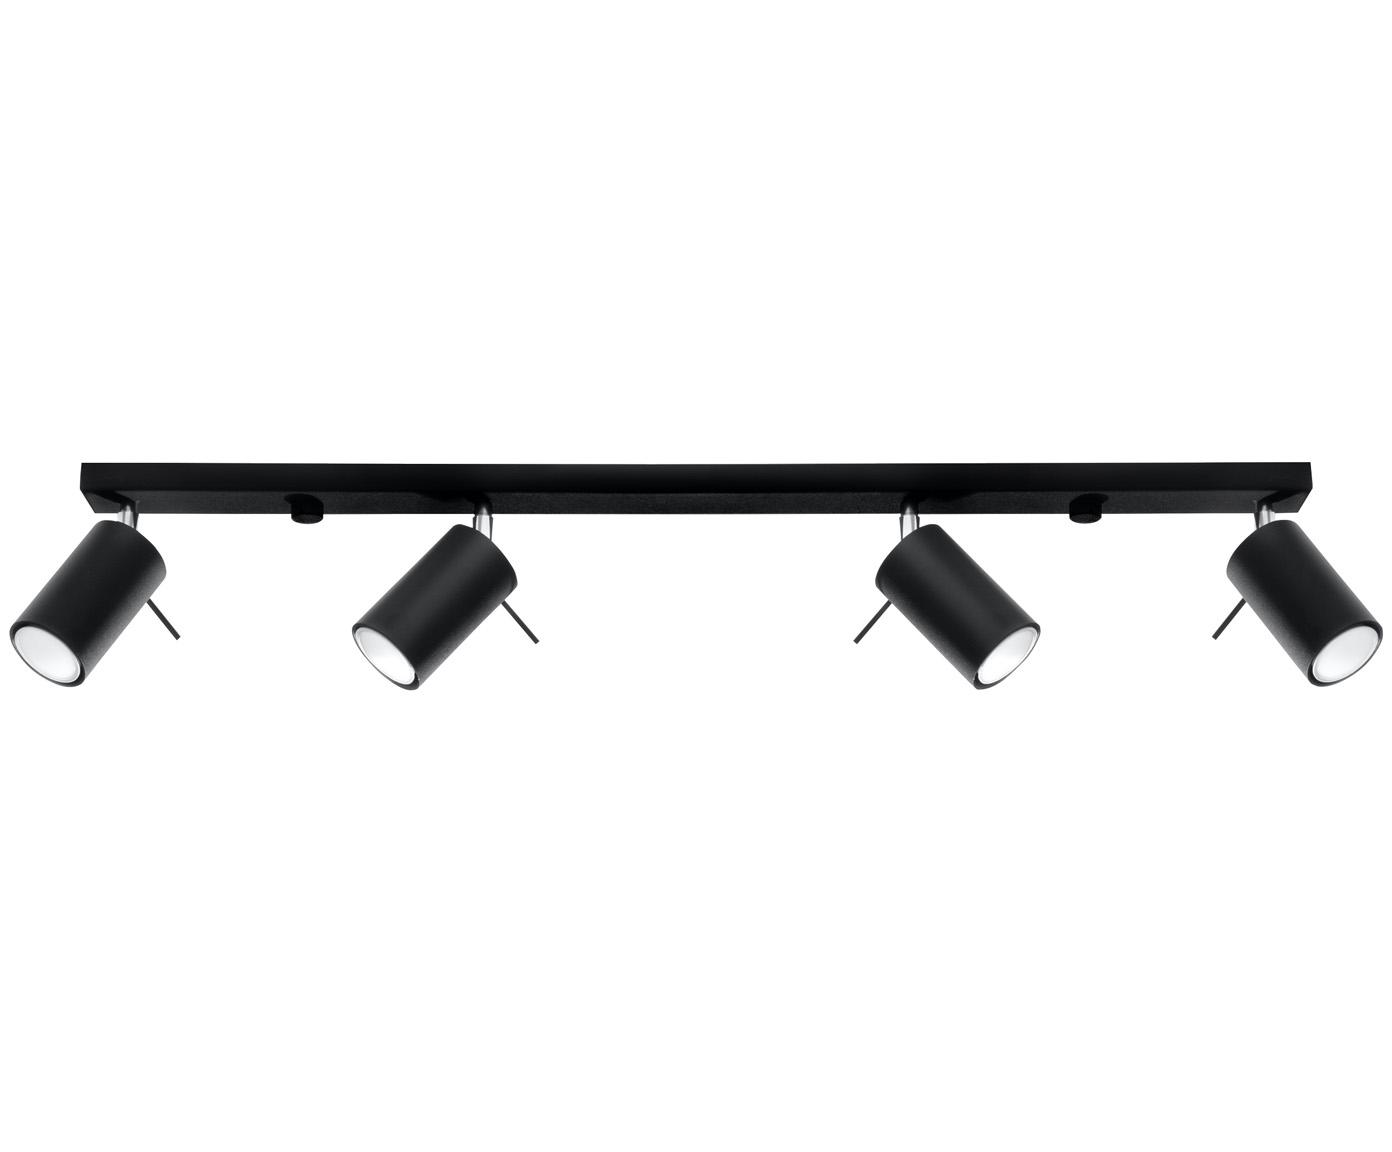 Grosser Deckenstrahler Etna, Lampenschirm: Stahl, beschichtet, Baldachin: Stahl, beschichtet, Schwarz, 81 x 16 cm